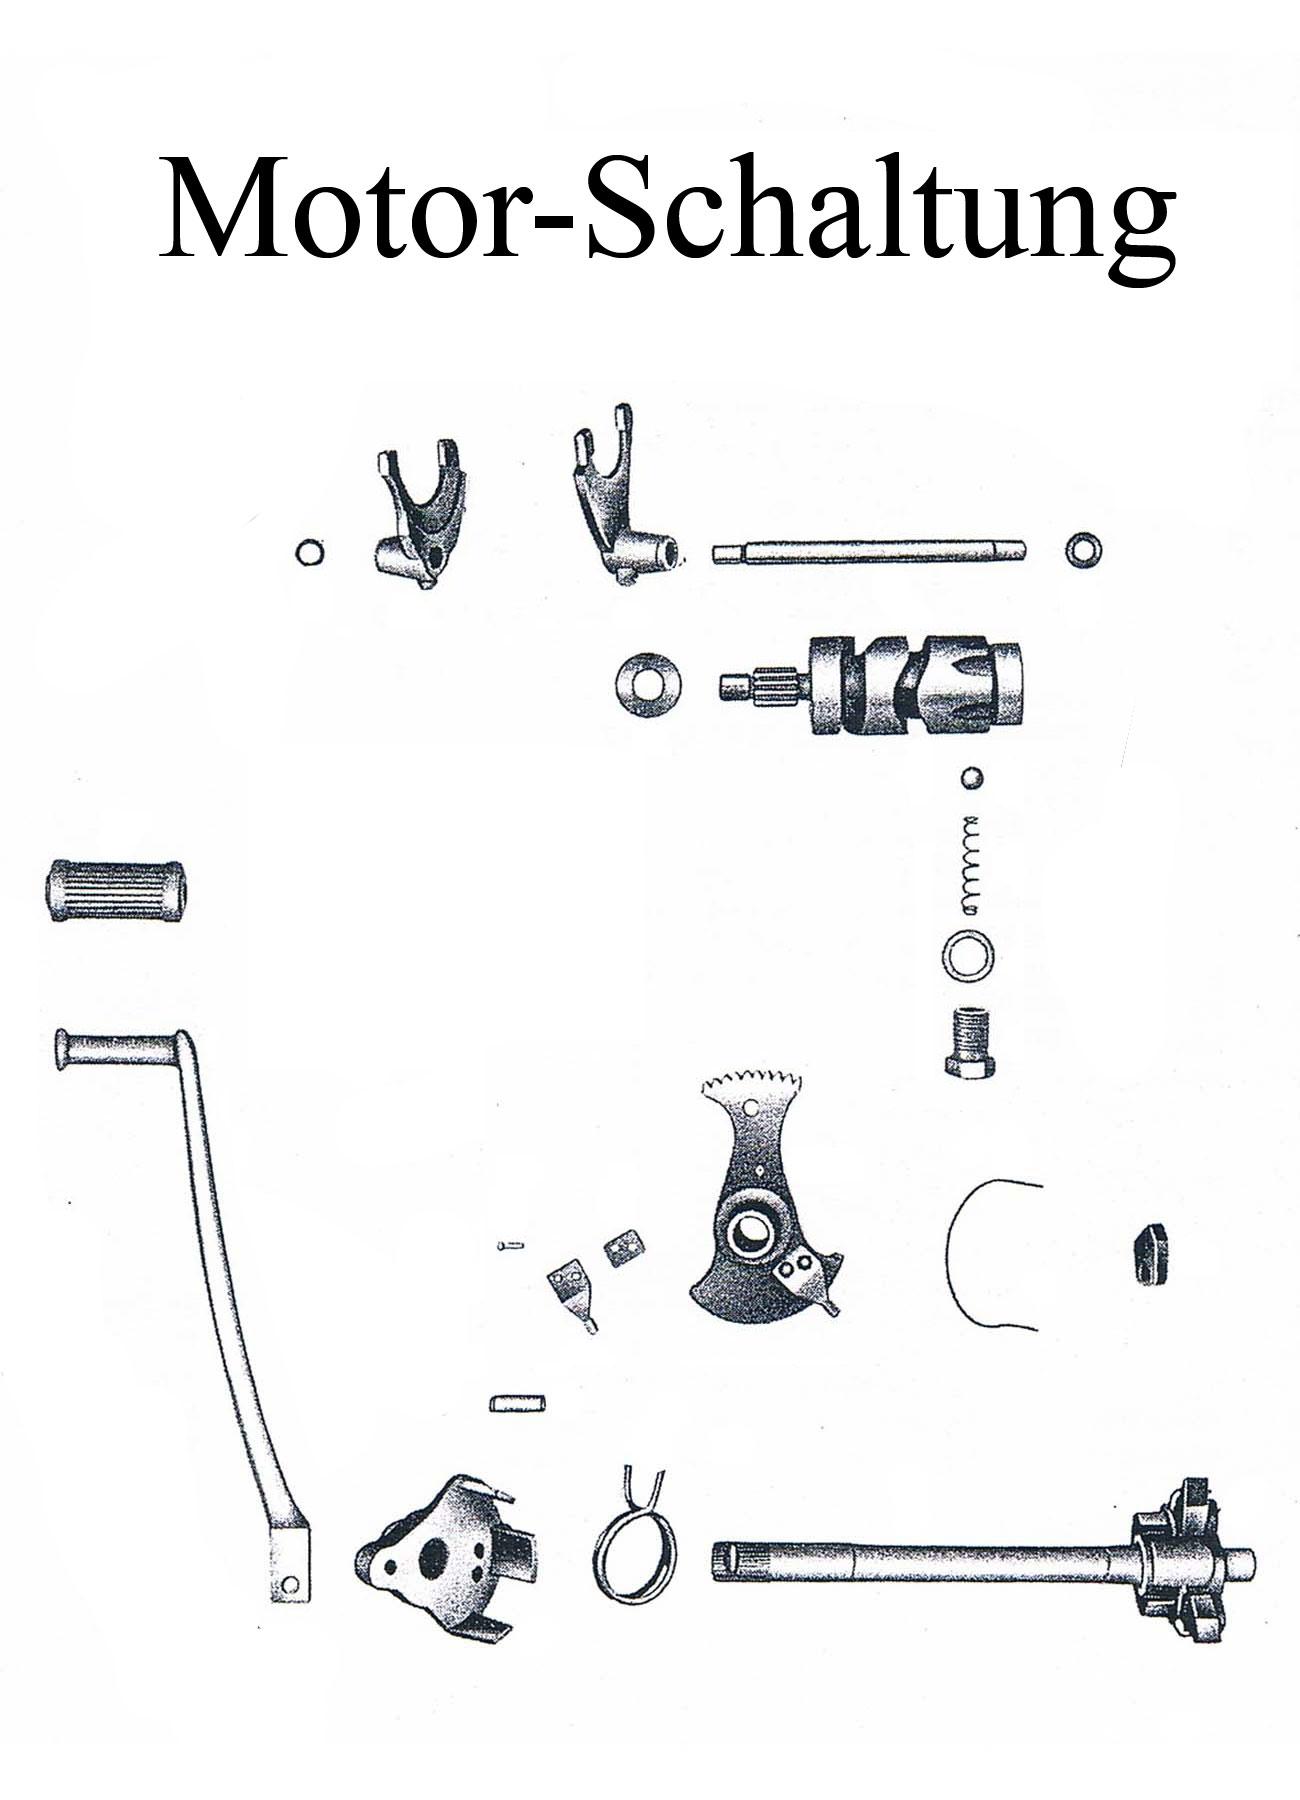 MZ ES 175/2-250/2 Ersatzteileliste Motor Schaltung Fußschalthebelgummi Welle Schaltklinkenarretierfeder